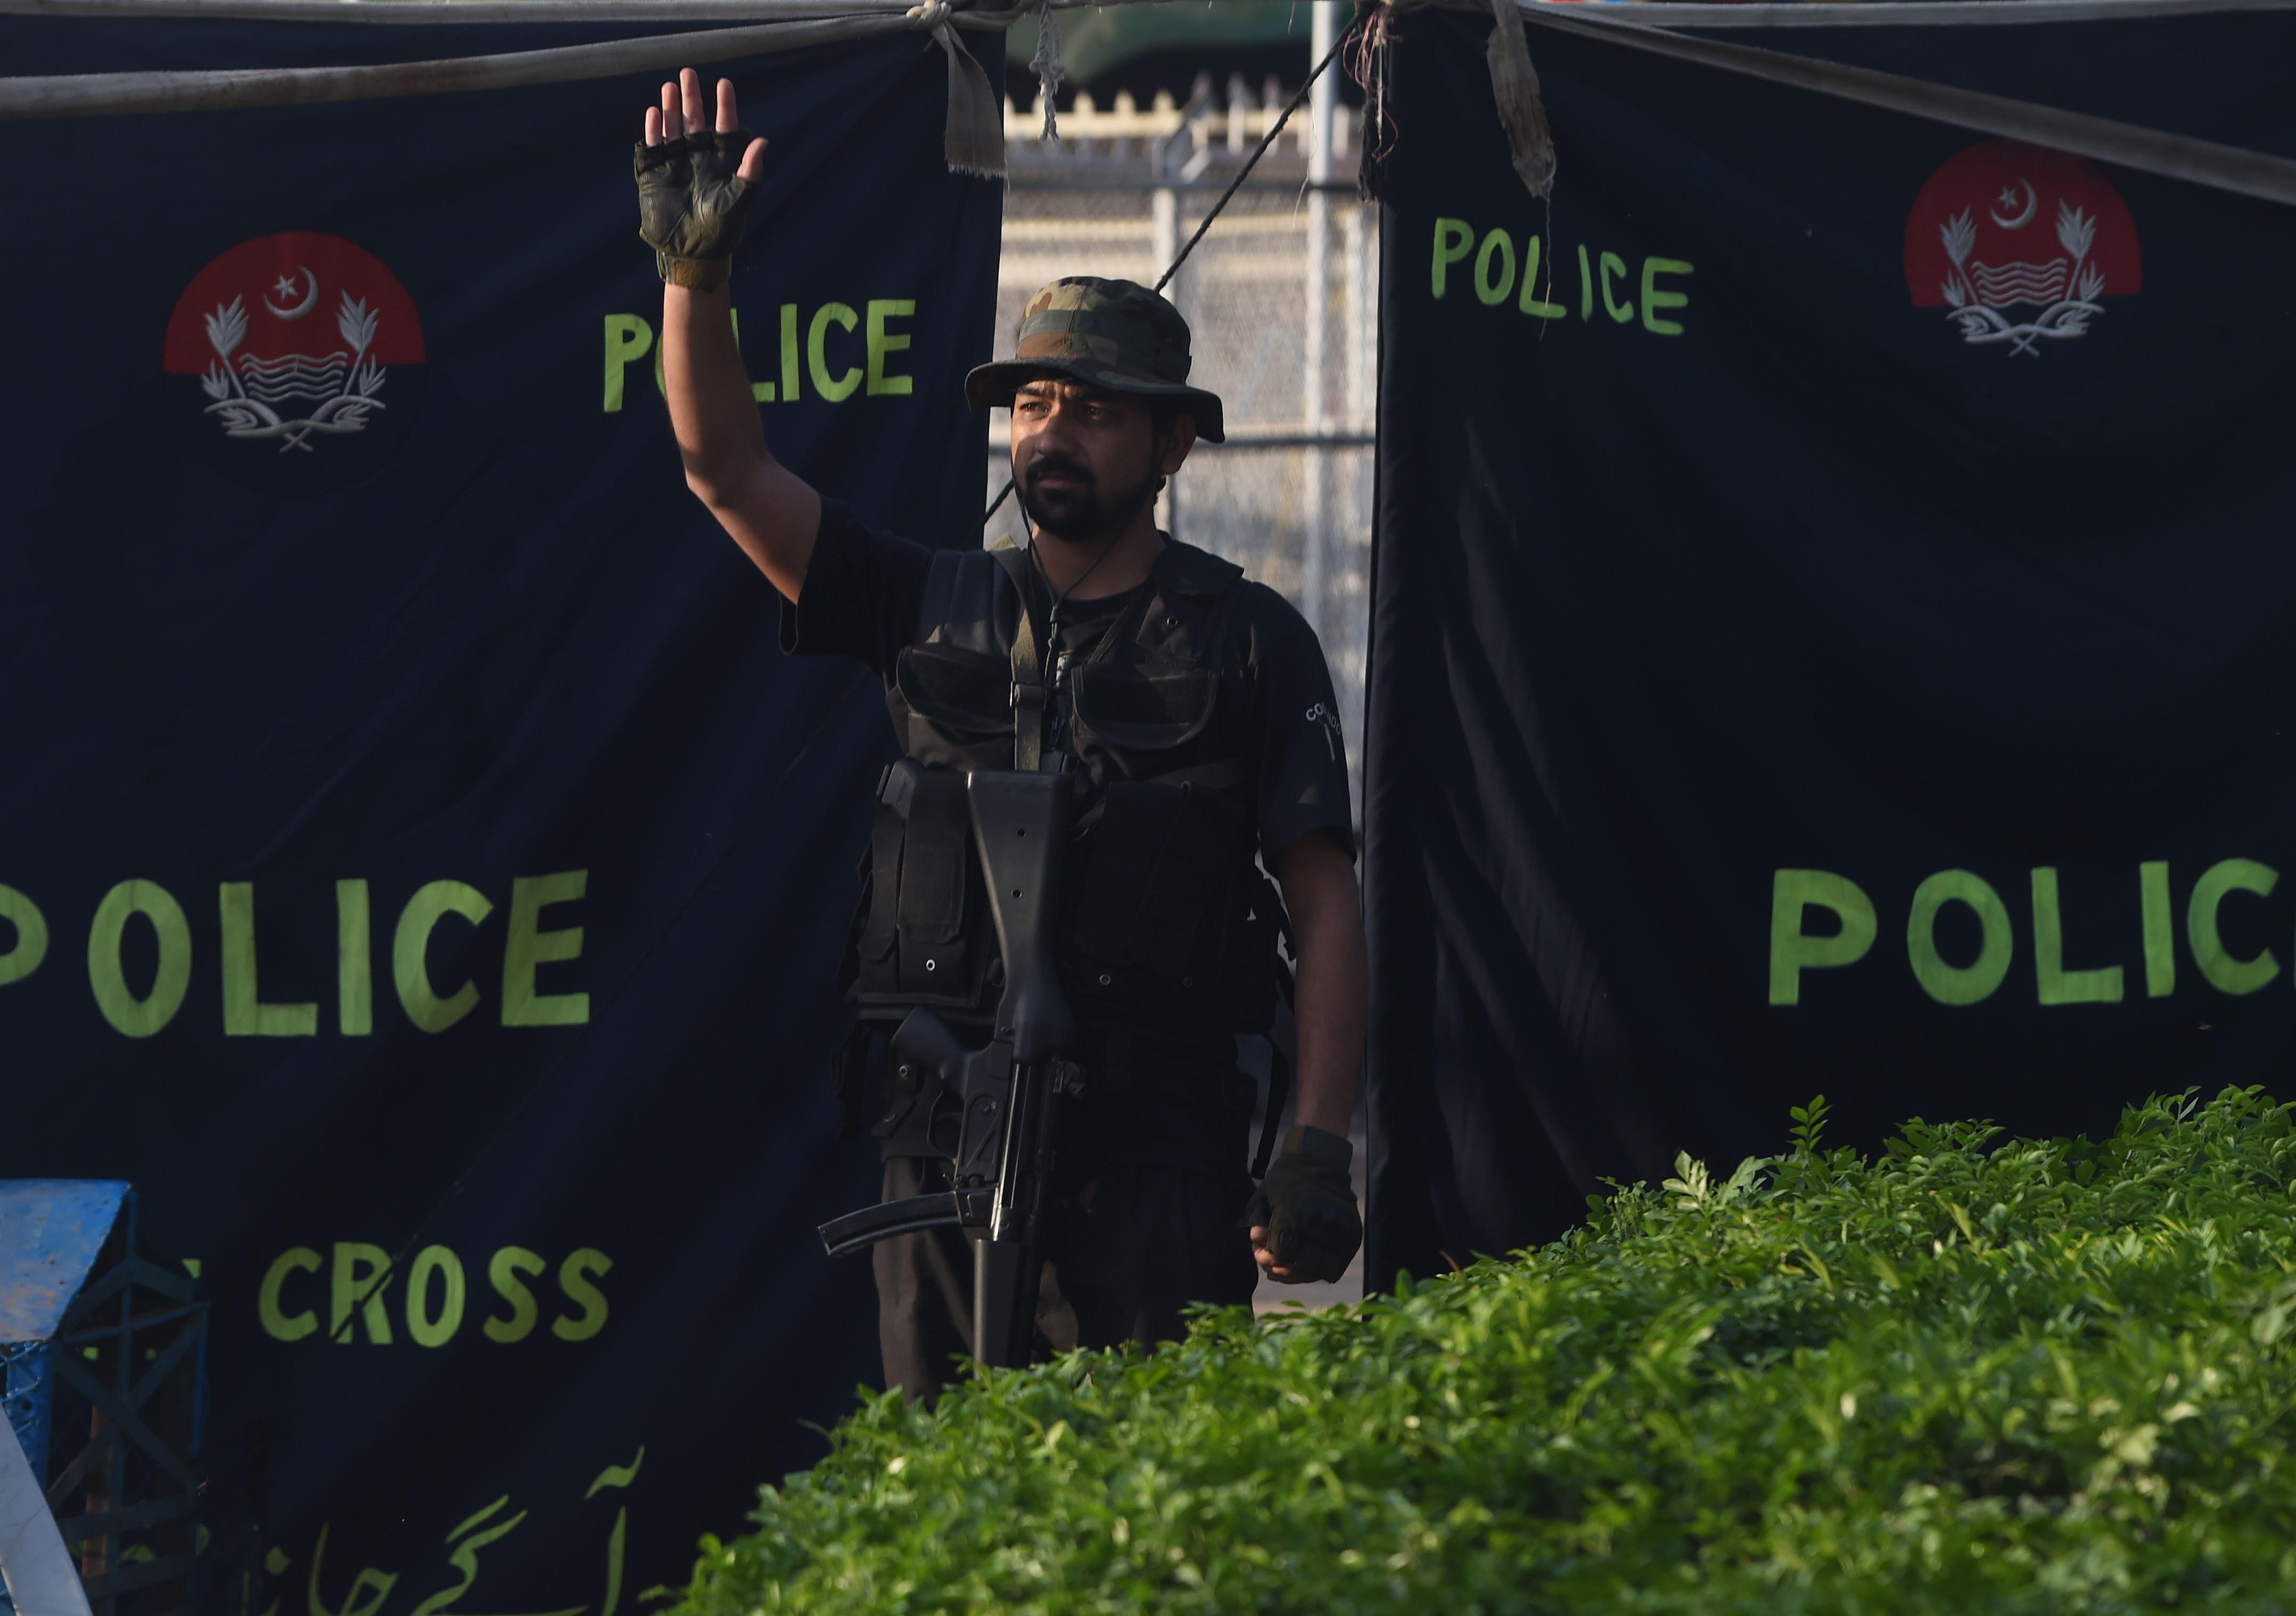 Punjab, Sindh show security improvements; other provinces slide: report